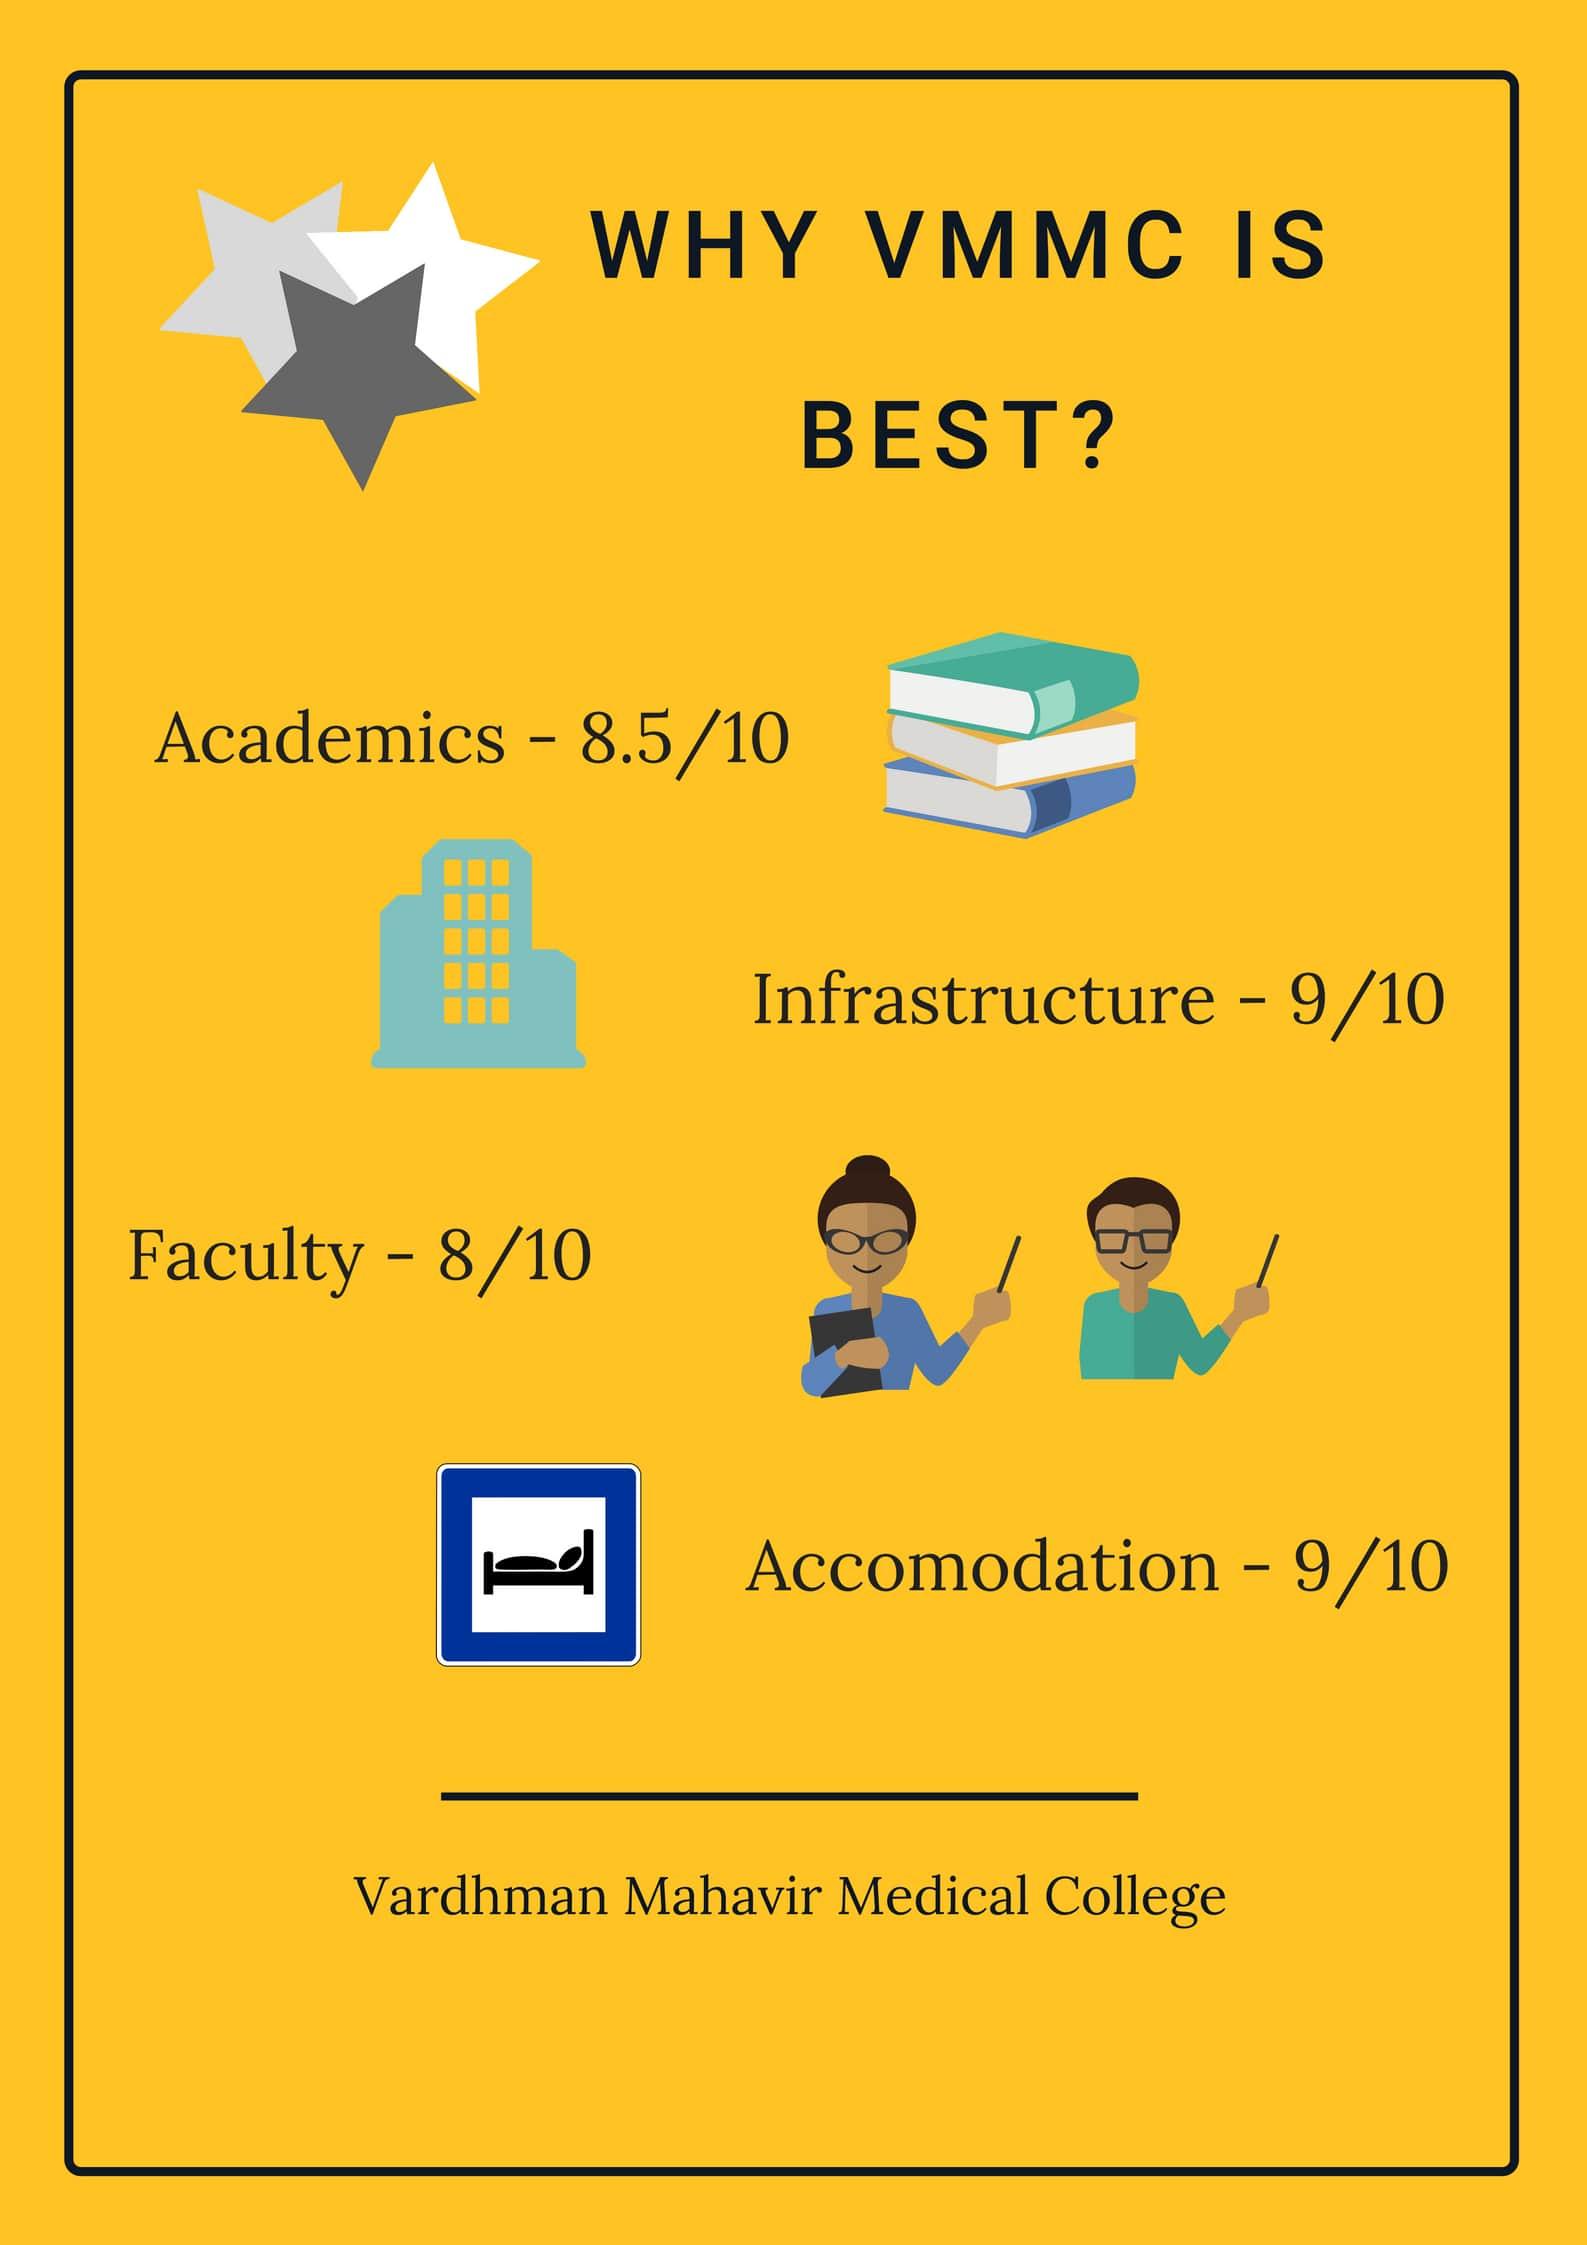 44246976614_3b72fa4ba8_o Vardhman Mahavir Medical College Application Form on